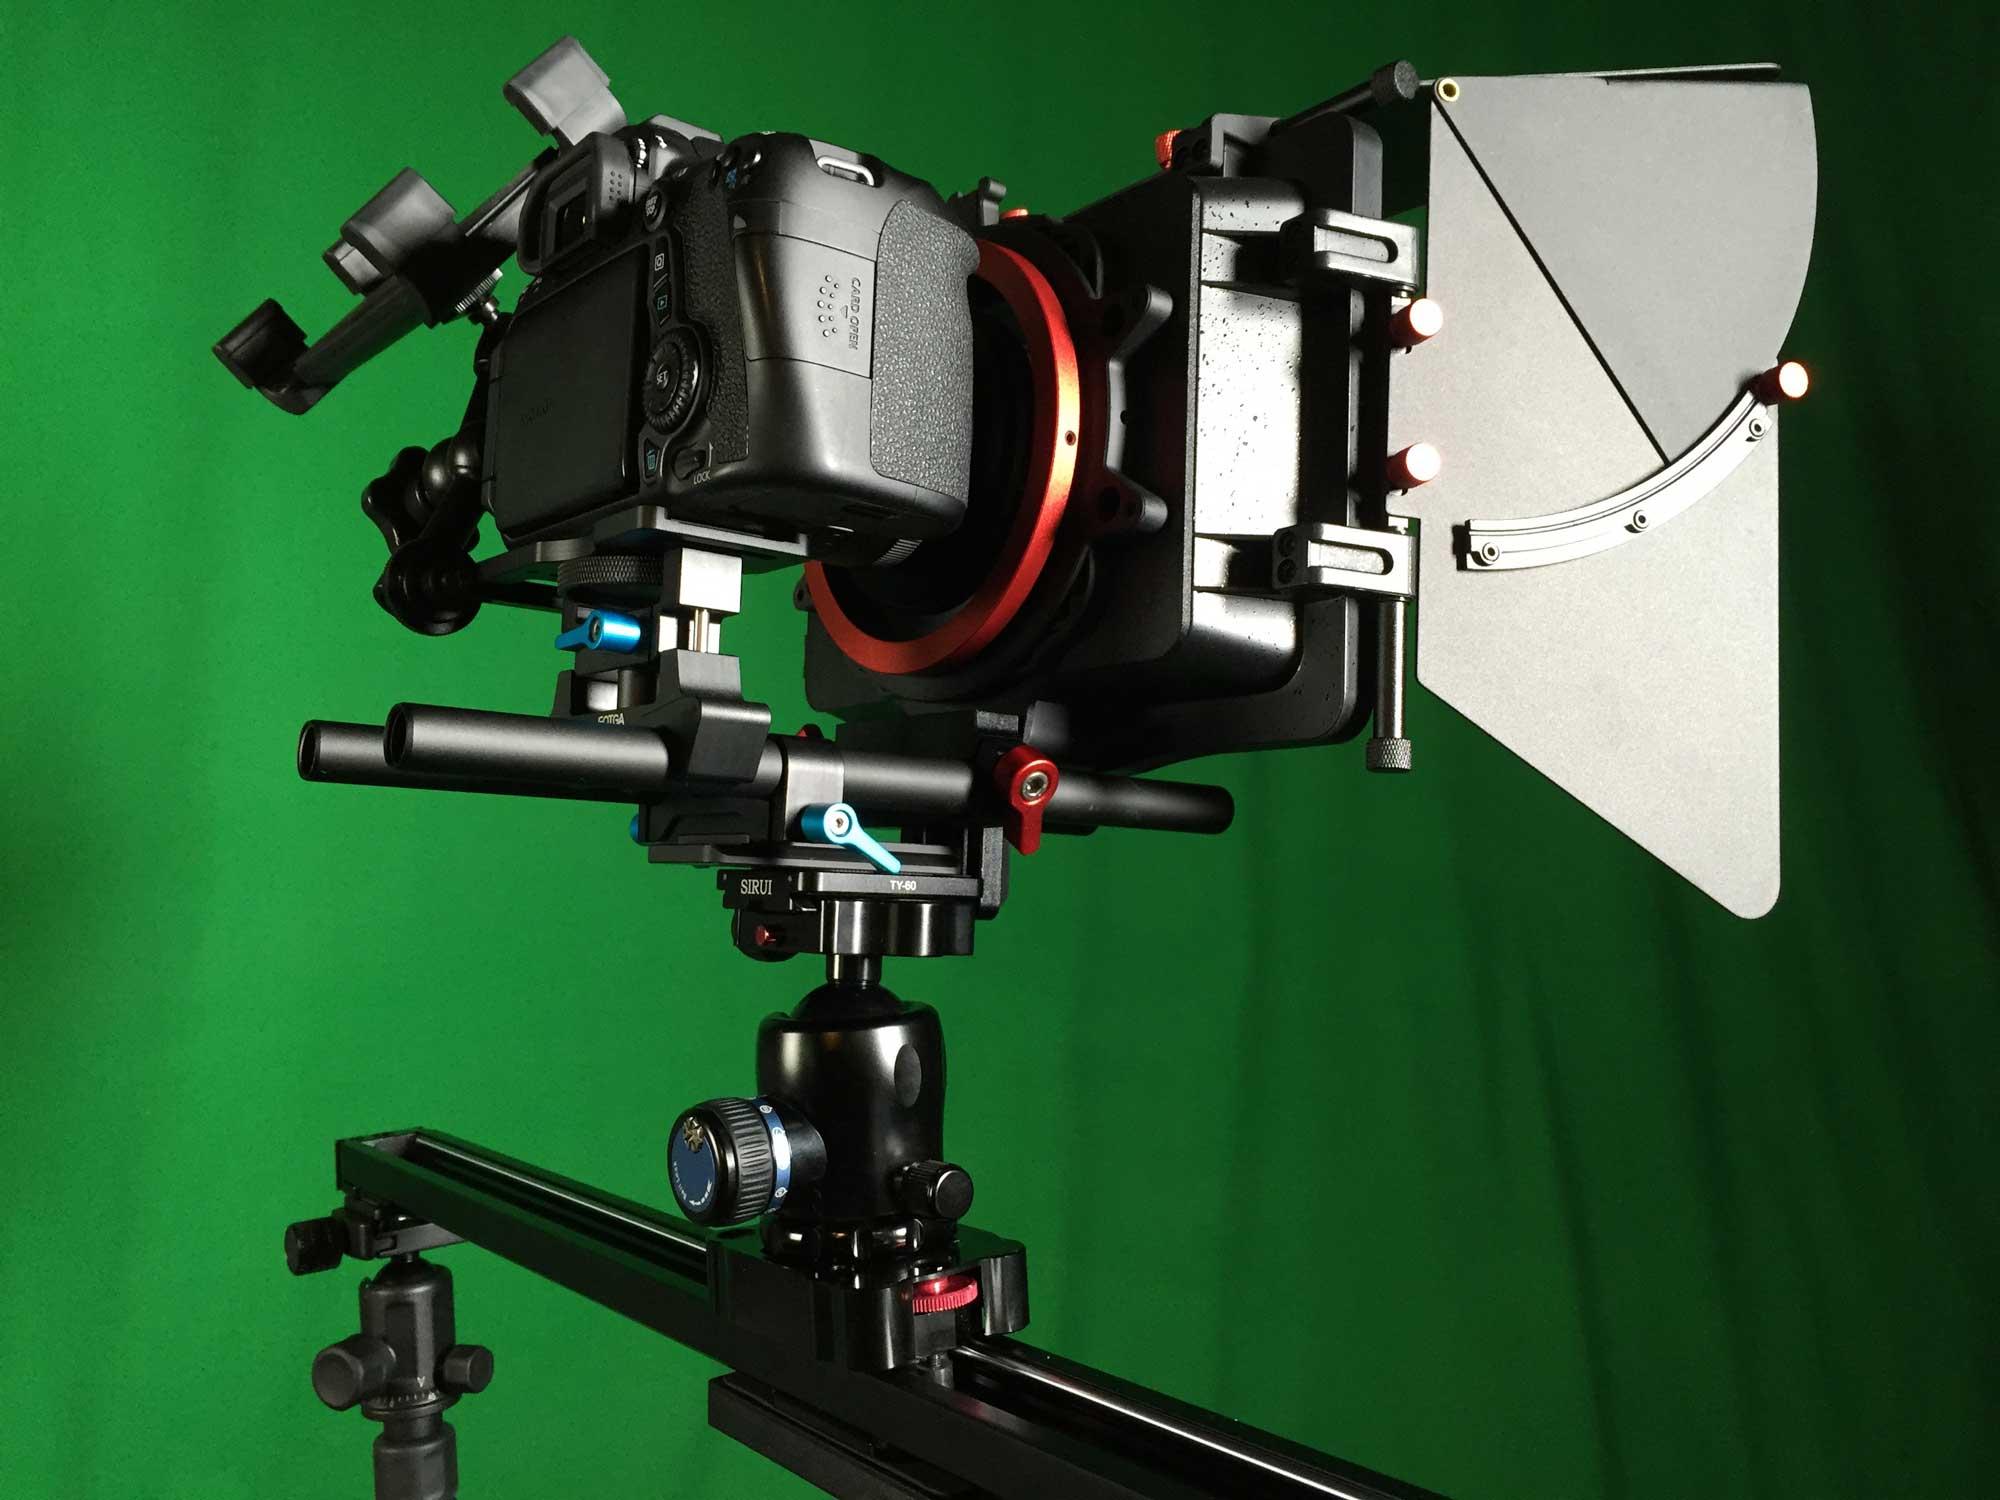 Homeoffice-Videokonferenz-Greenscreen-Technik-04